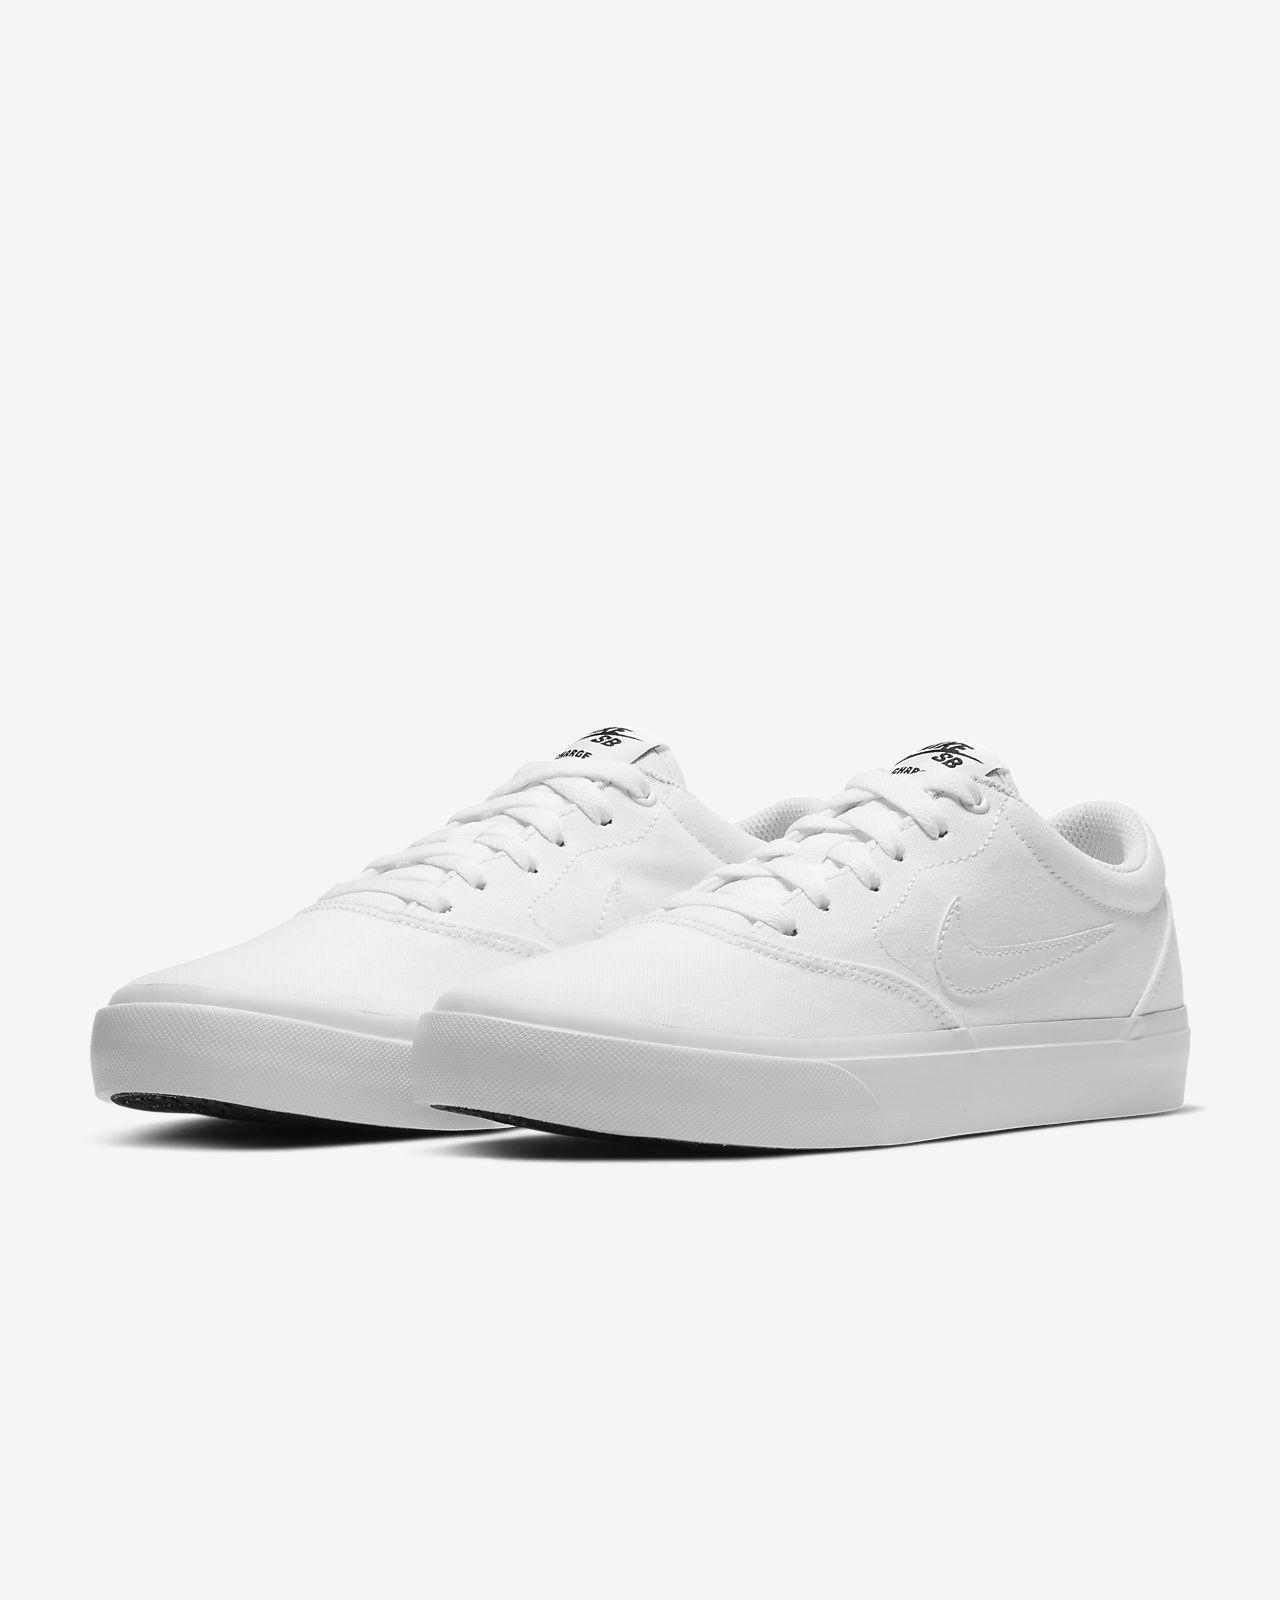 Calzado de skateboarding para mujer Nike SB Charge Canvas